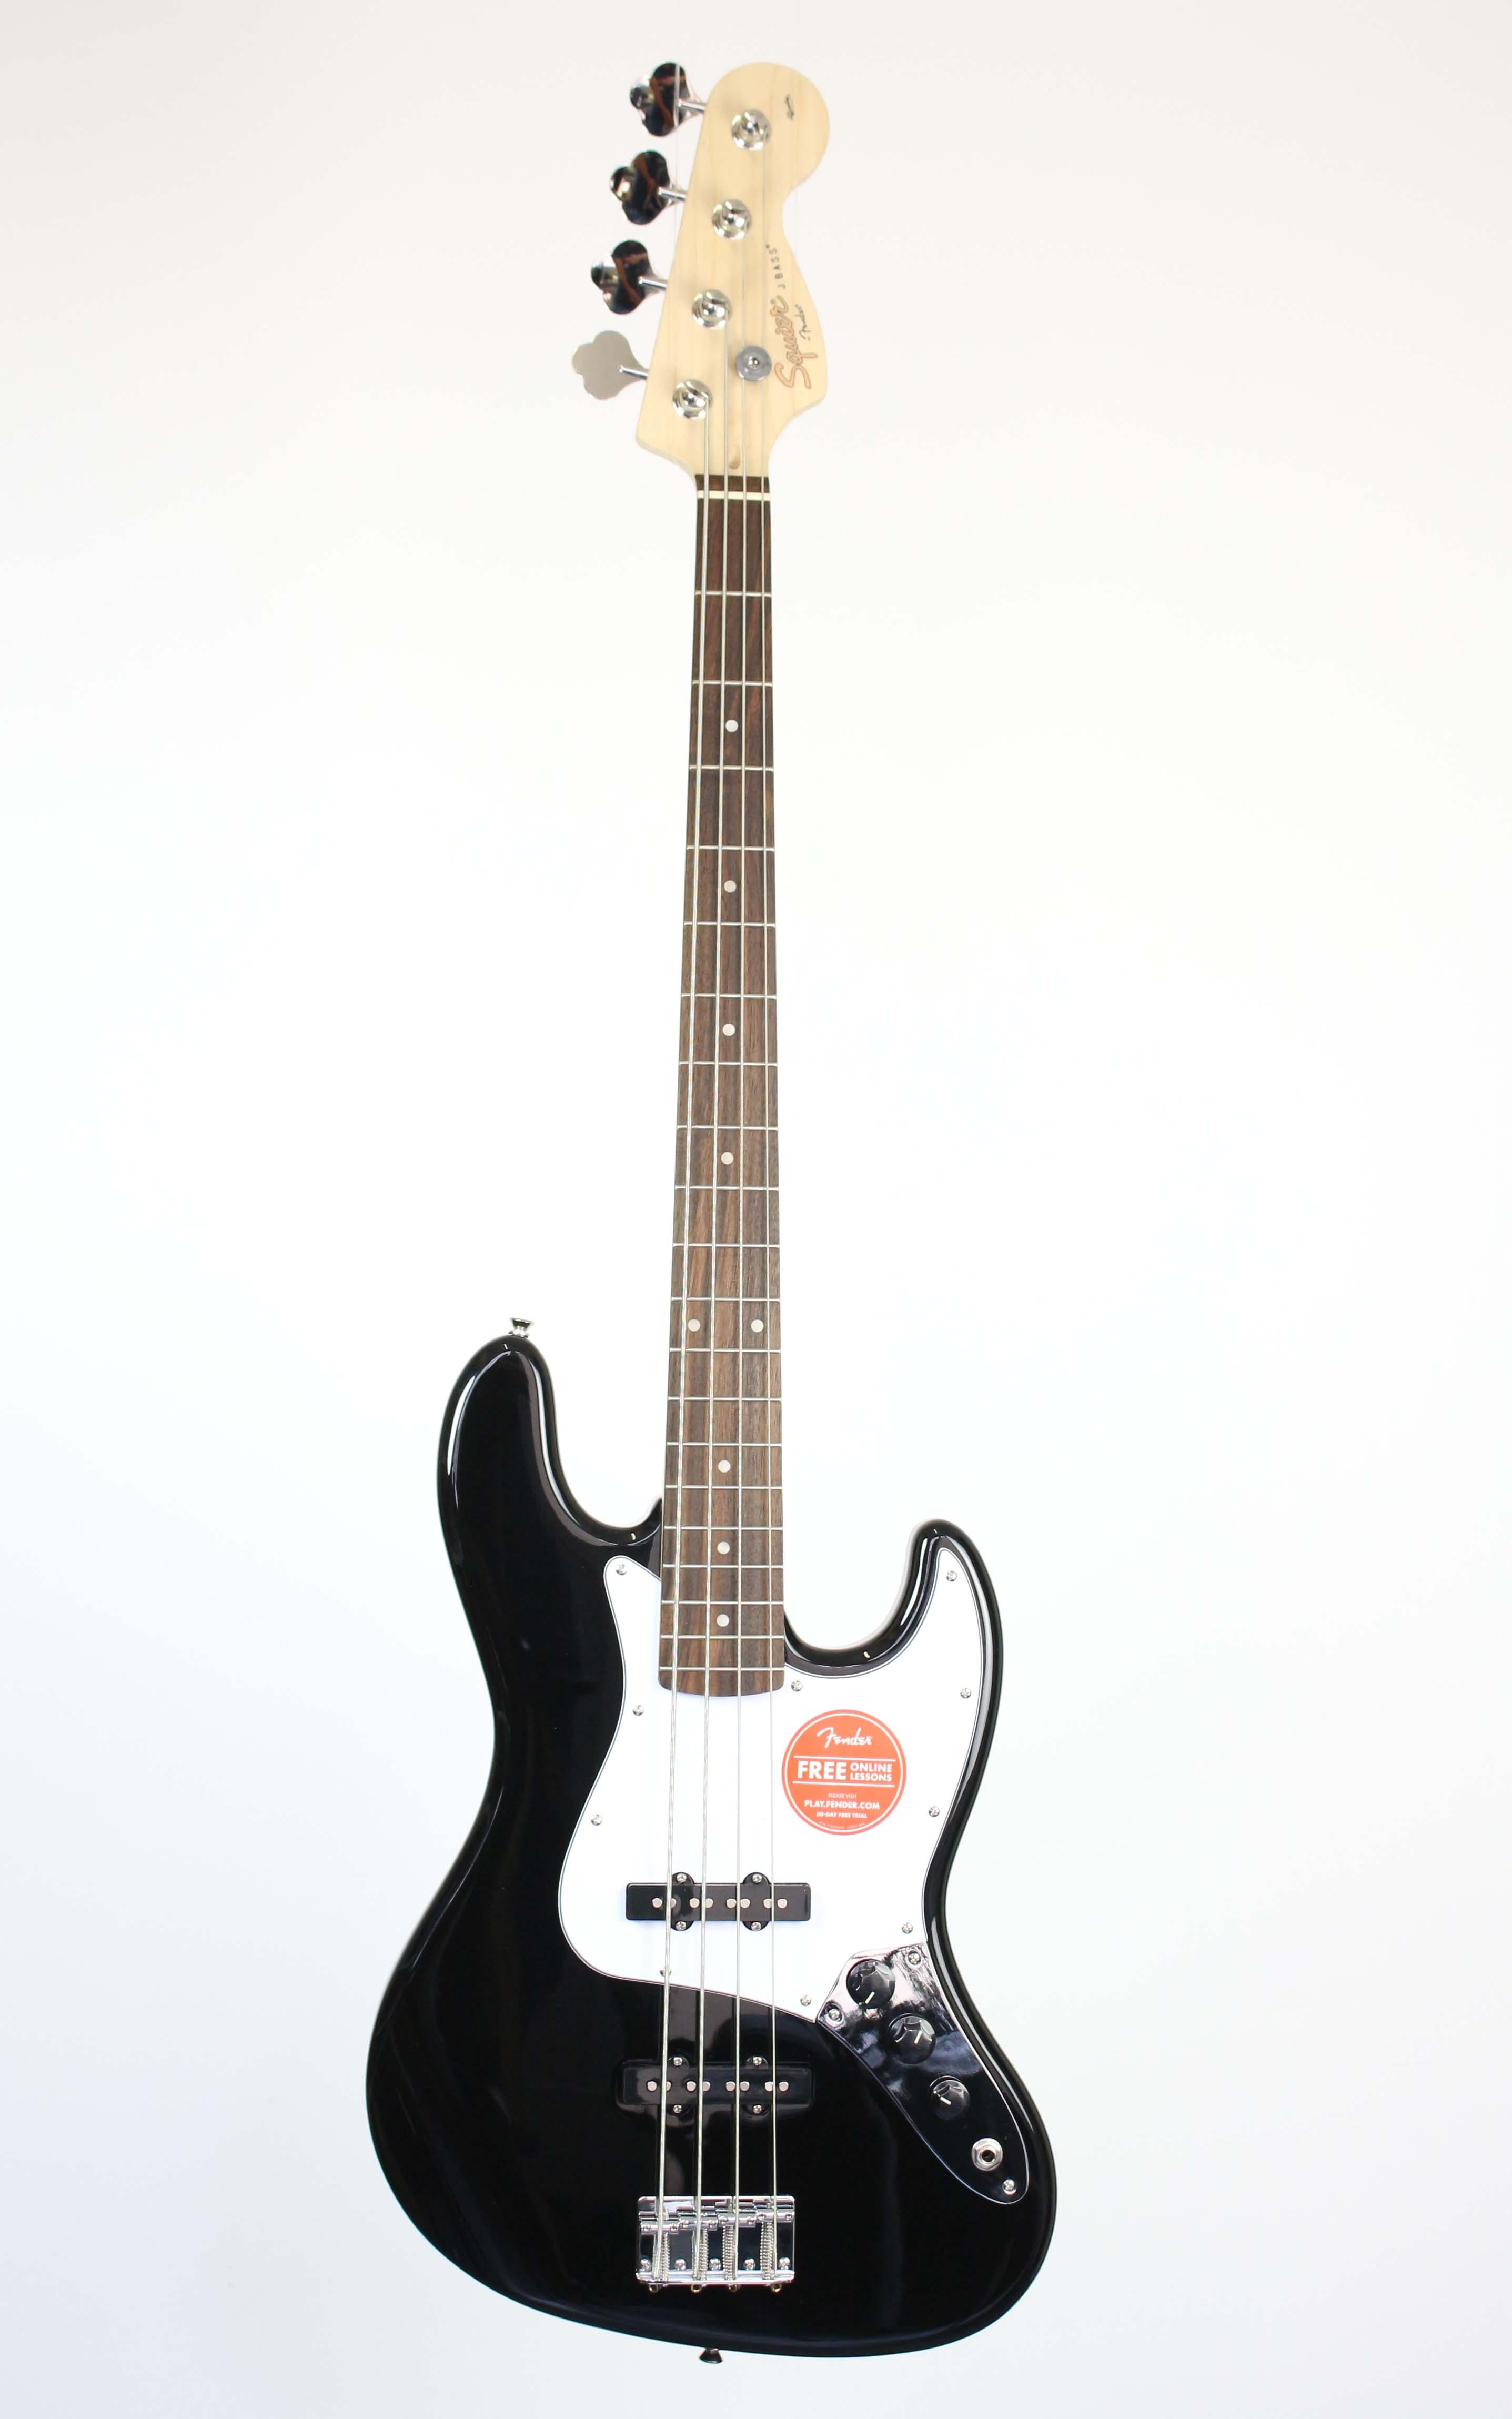 Fender Squier - Affinity Jazz Bass LRL BLK - Gitarren - E-Bass | MUSIK BERTRAM Deutschland Freiburg